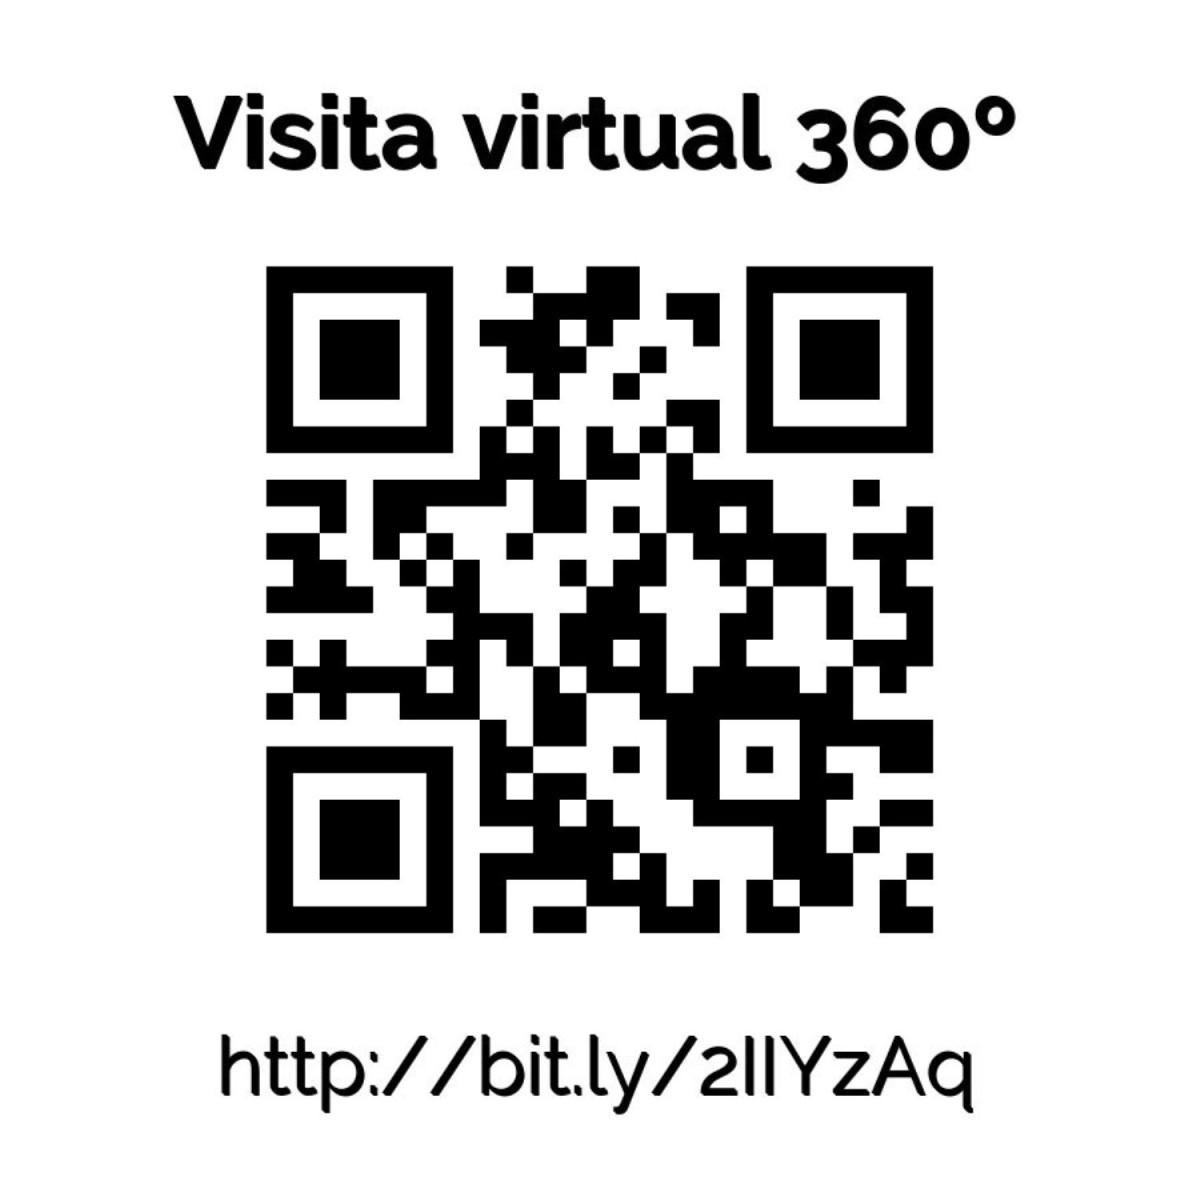 3408-03656